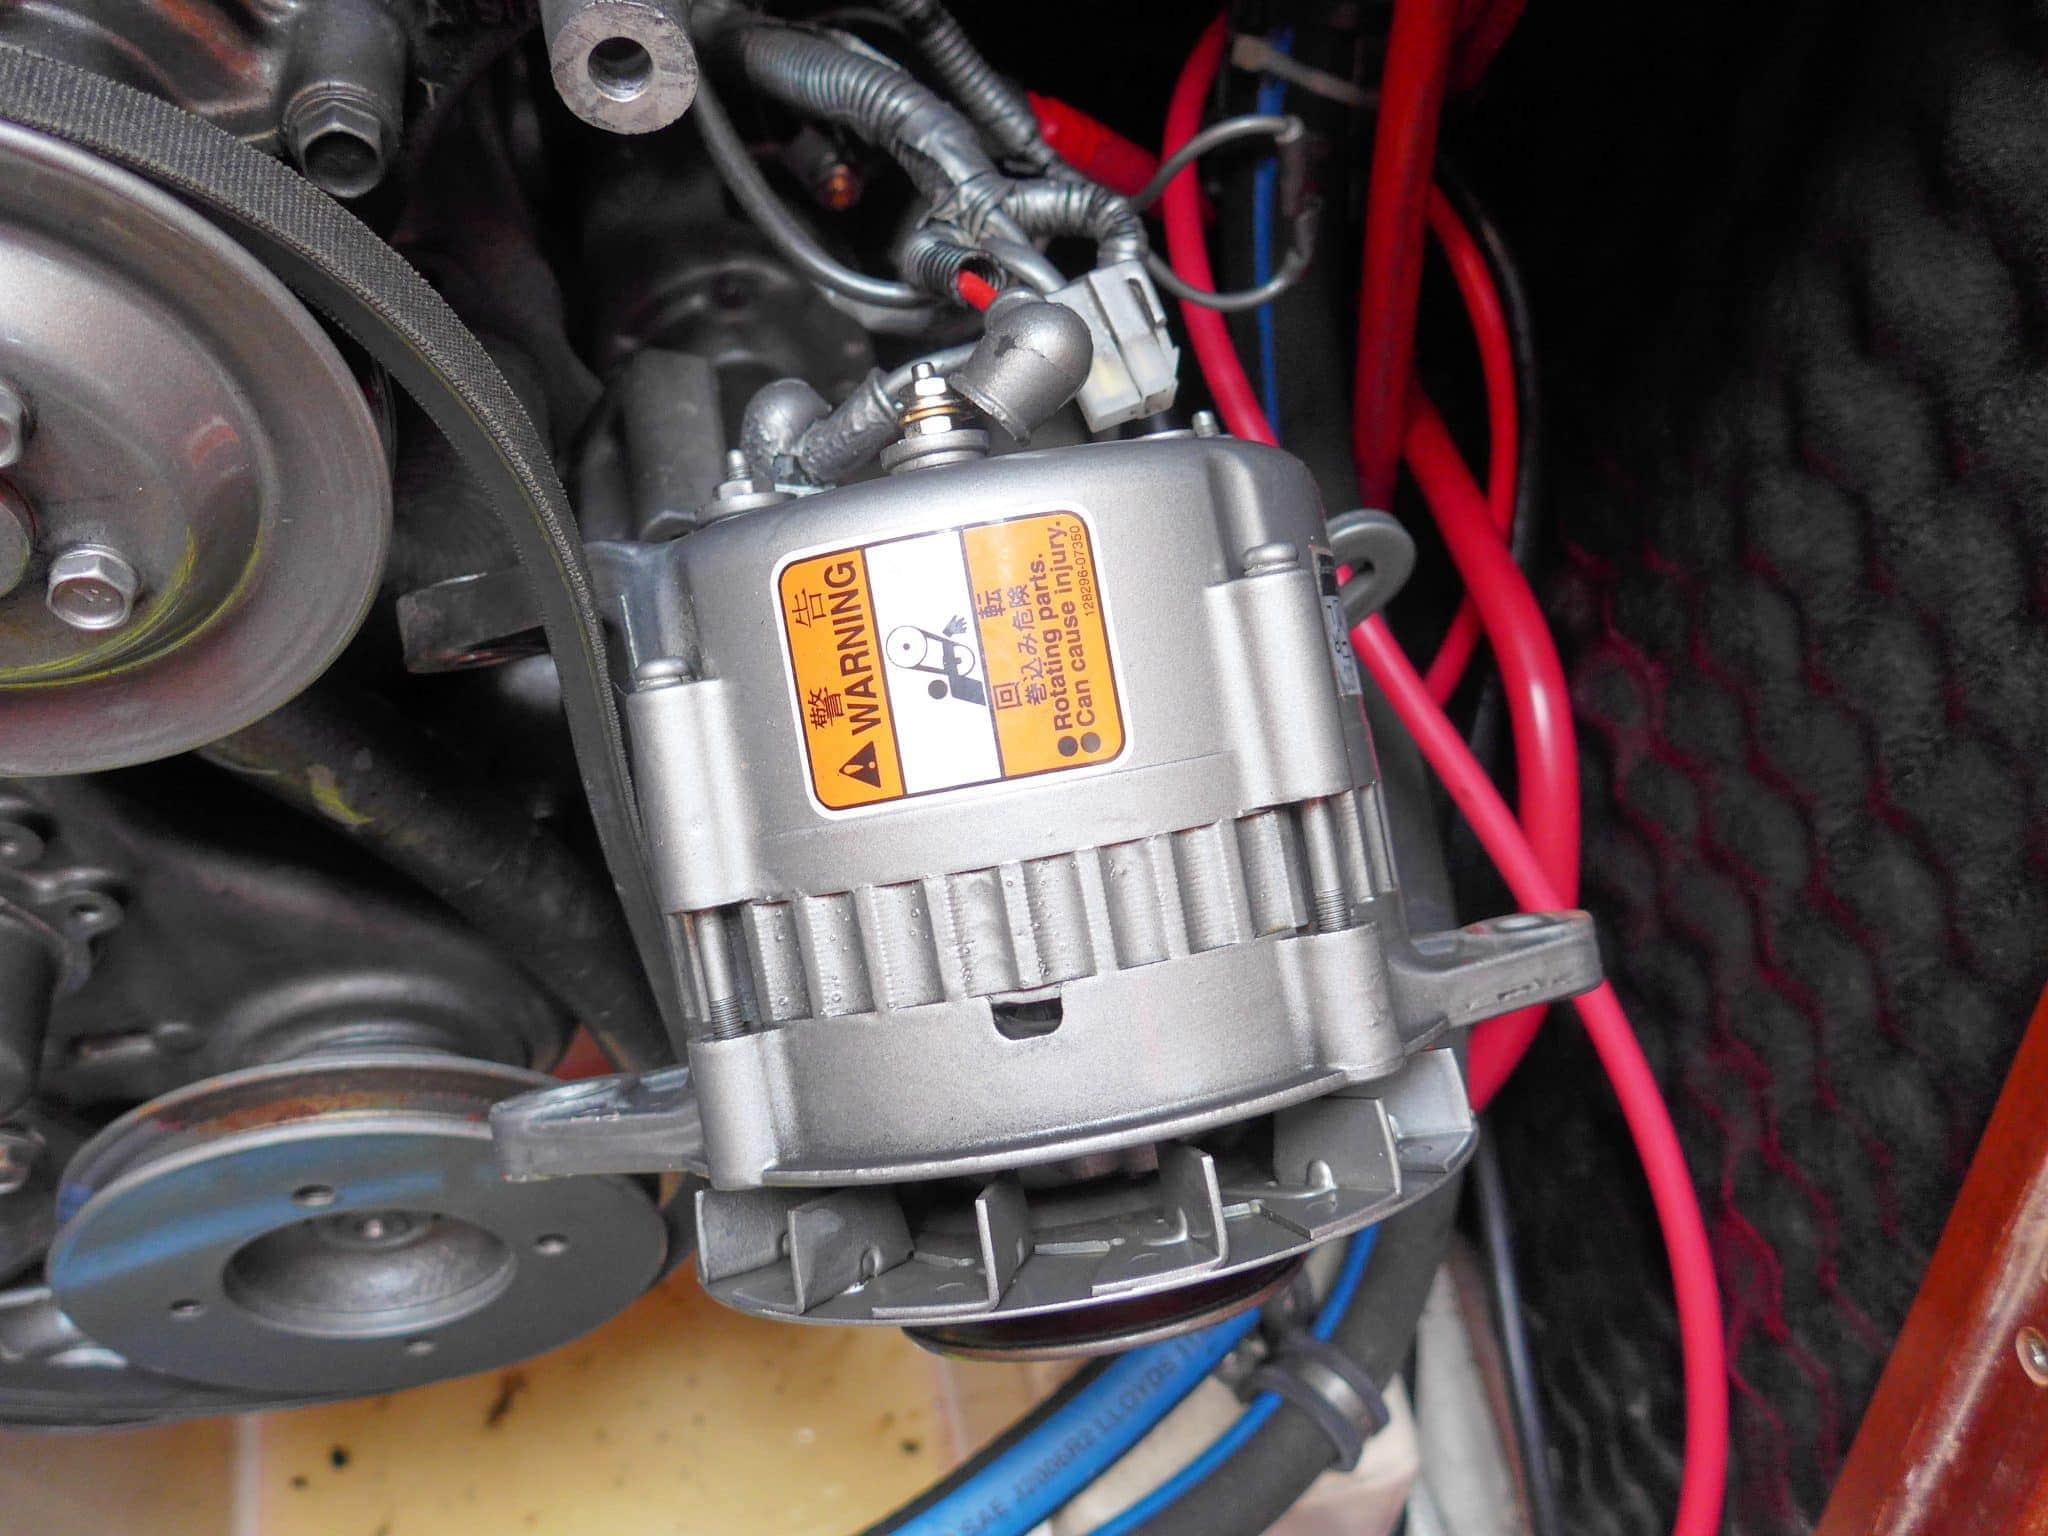 Old alternator